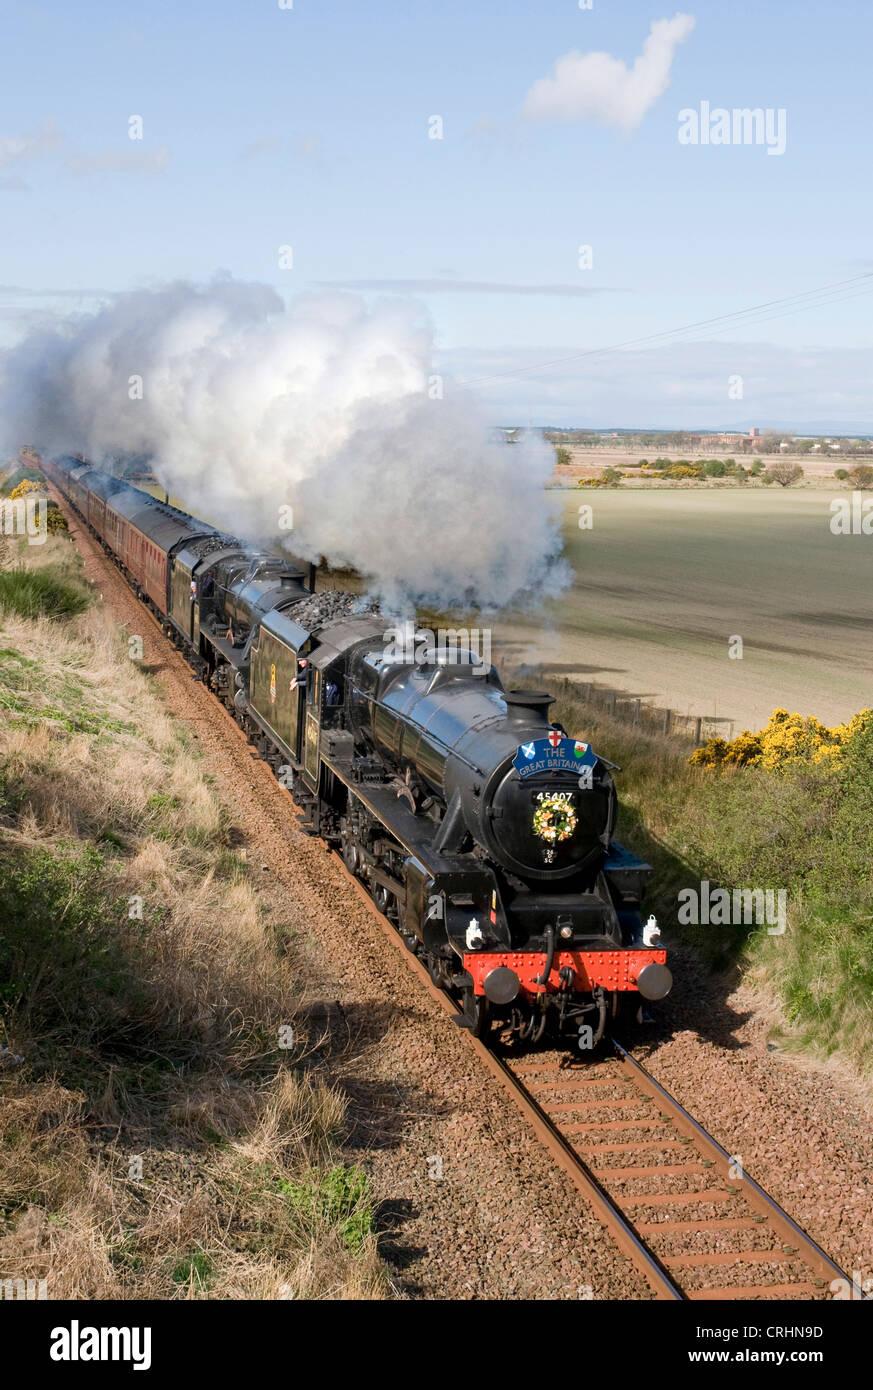 steam engine 45407 the lancashire fusilier, United Kingdom, Scotland - Stock Image